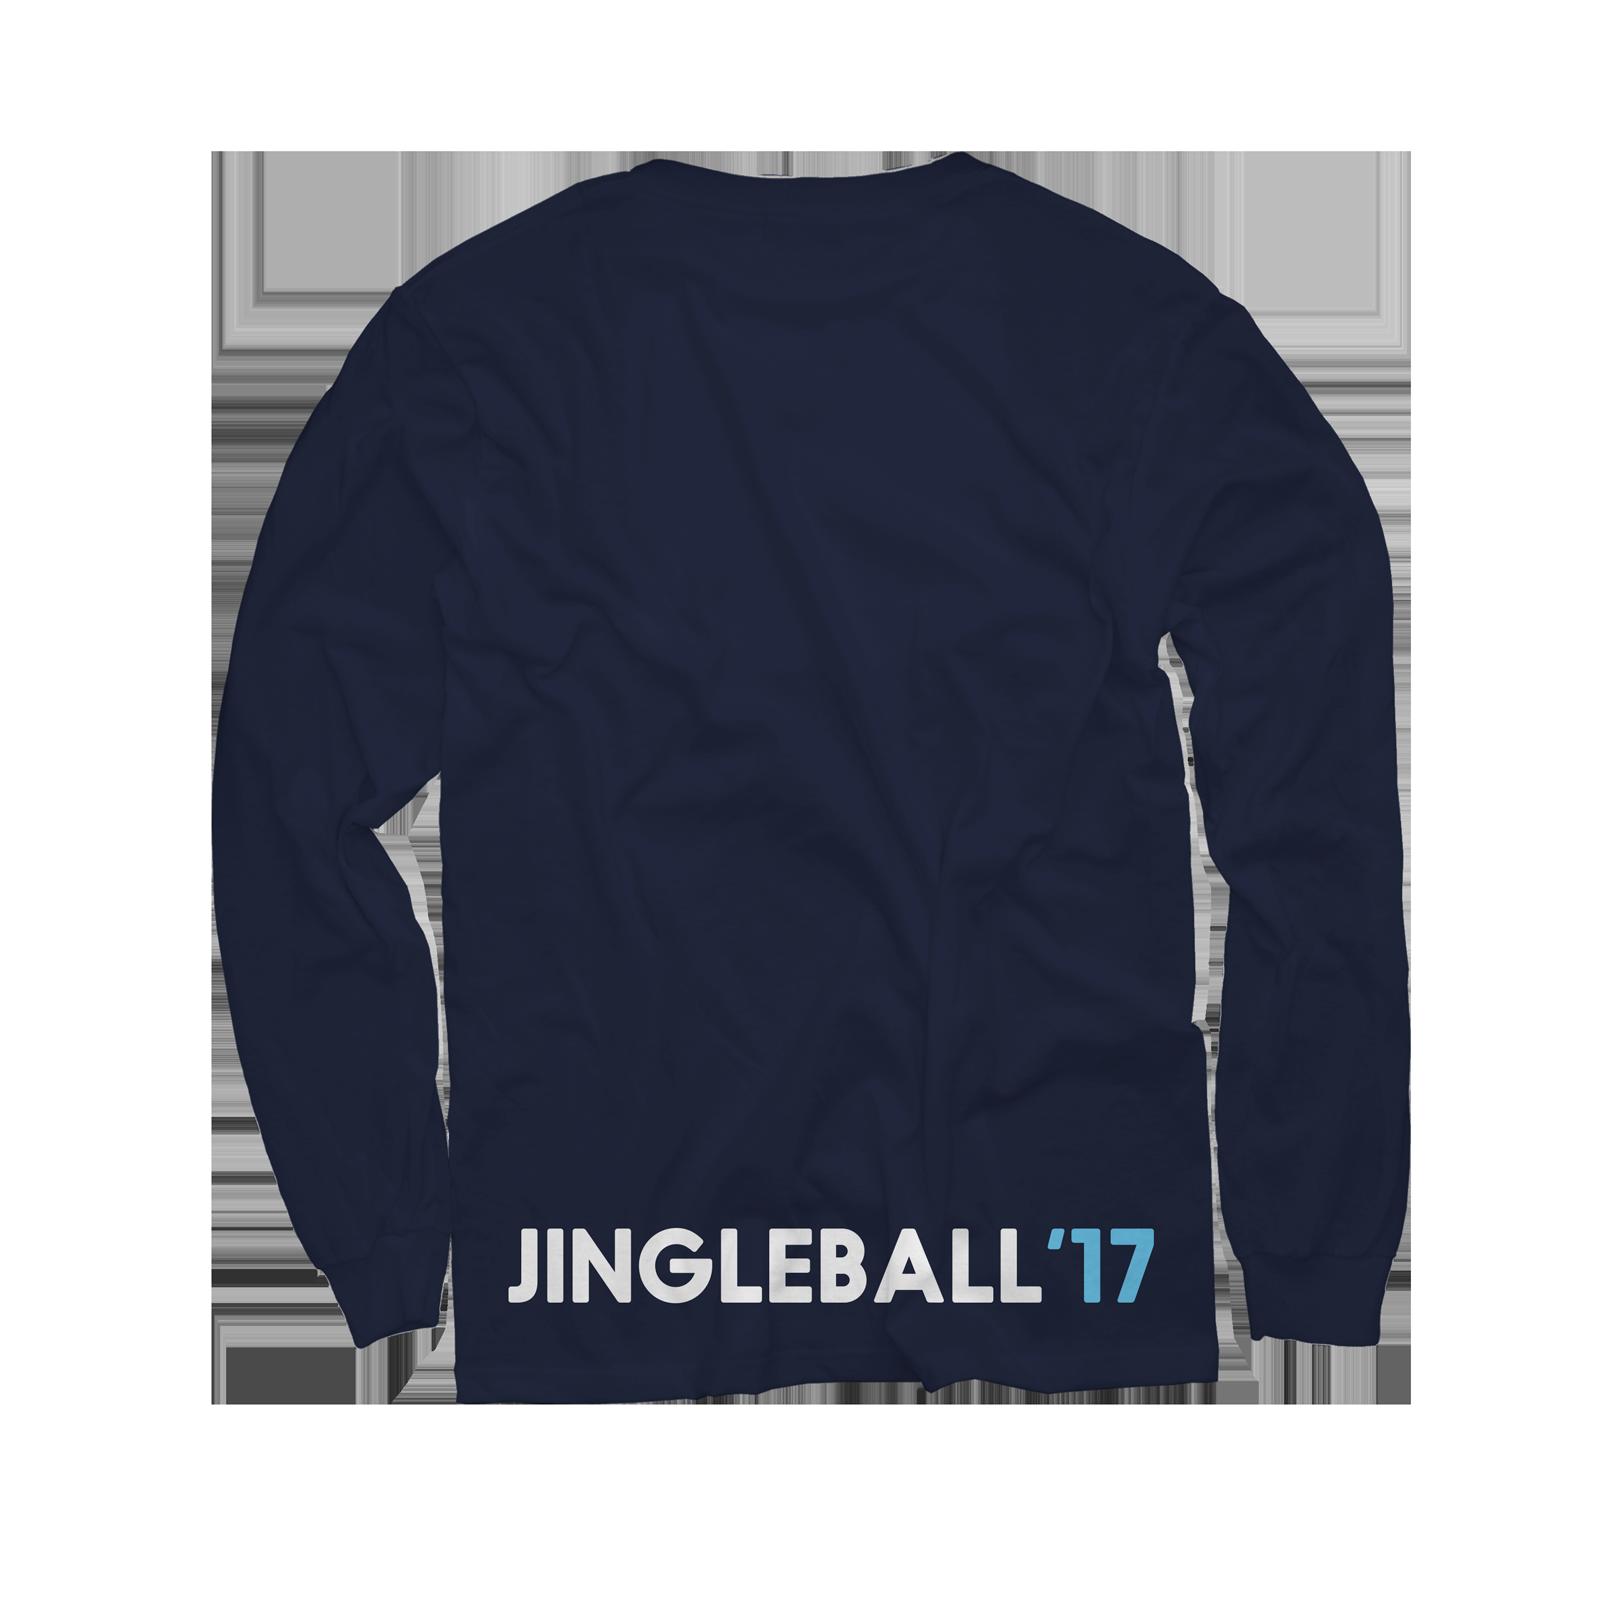 2017 Jingle Ball Tour Navy Longsleeve